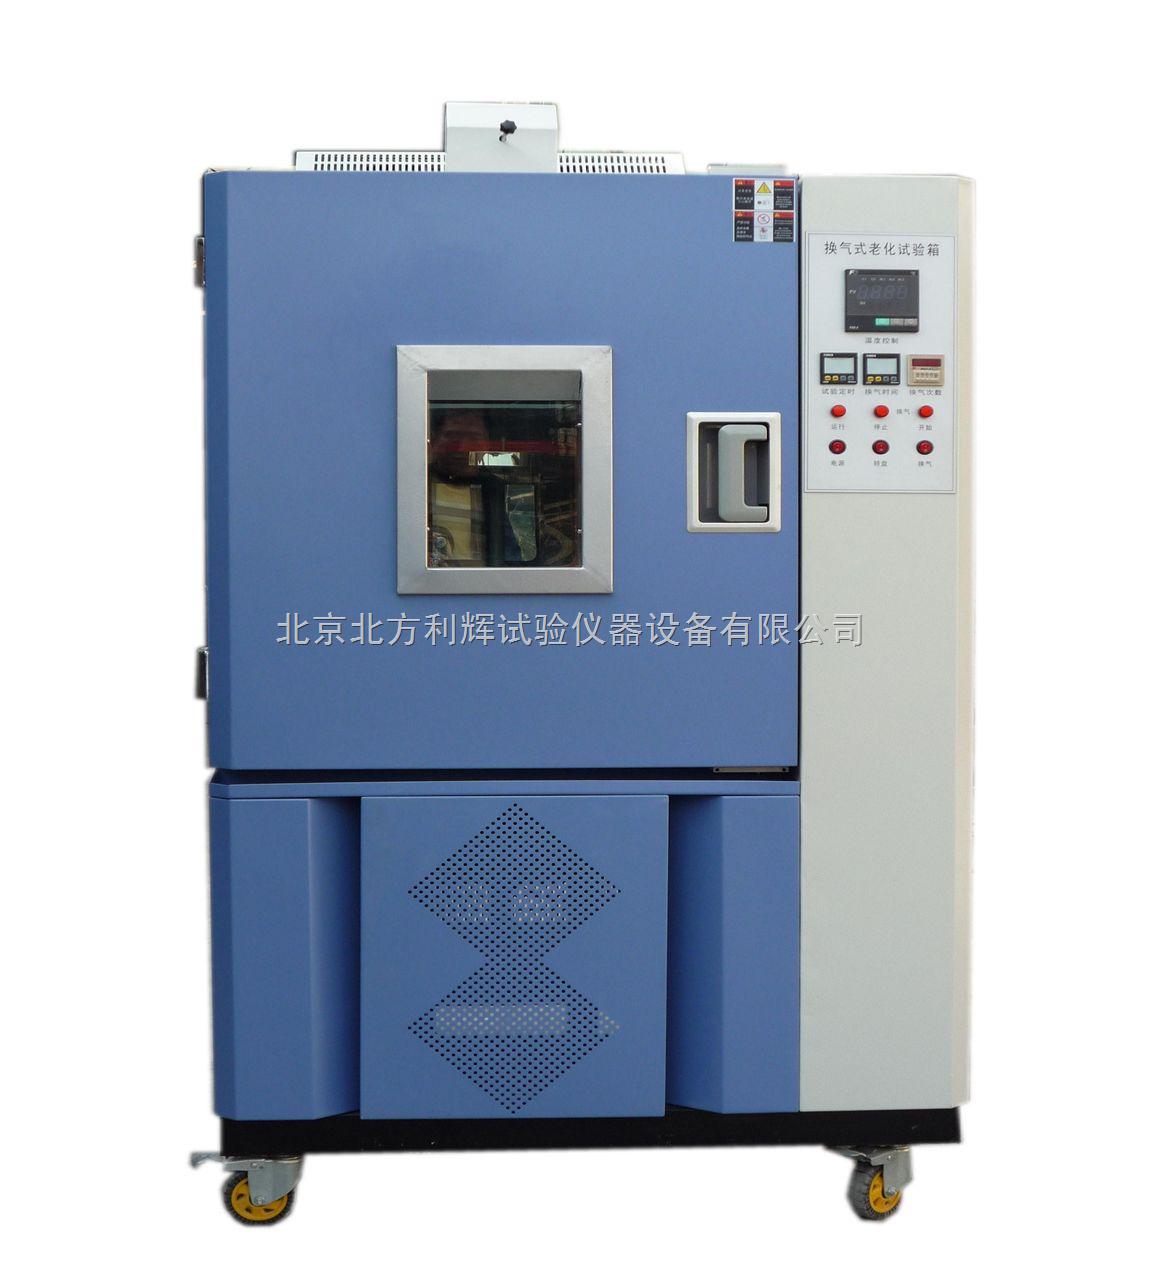 QLH-225橡胶高温老化试验箱